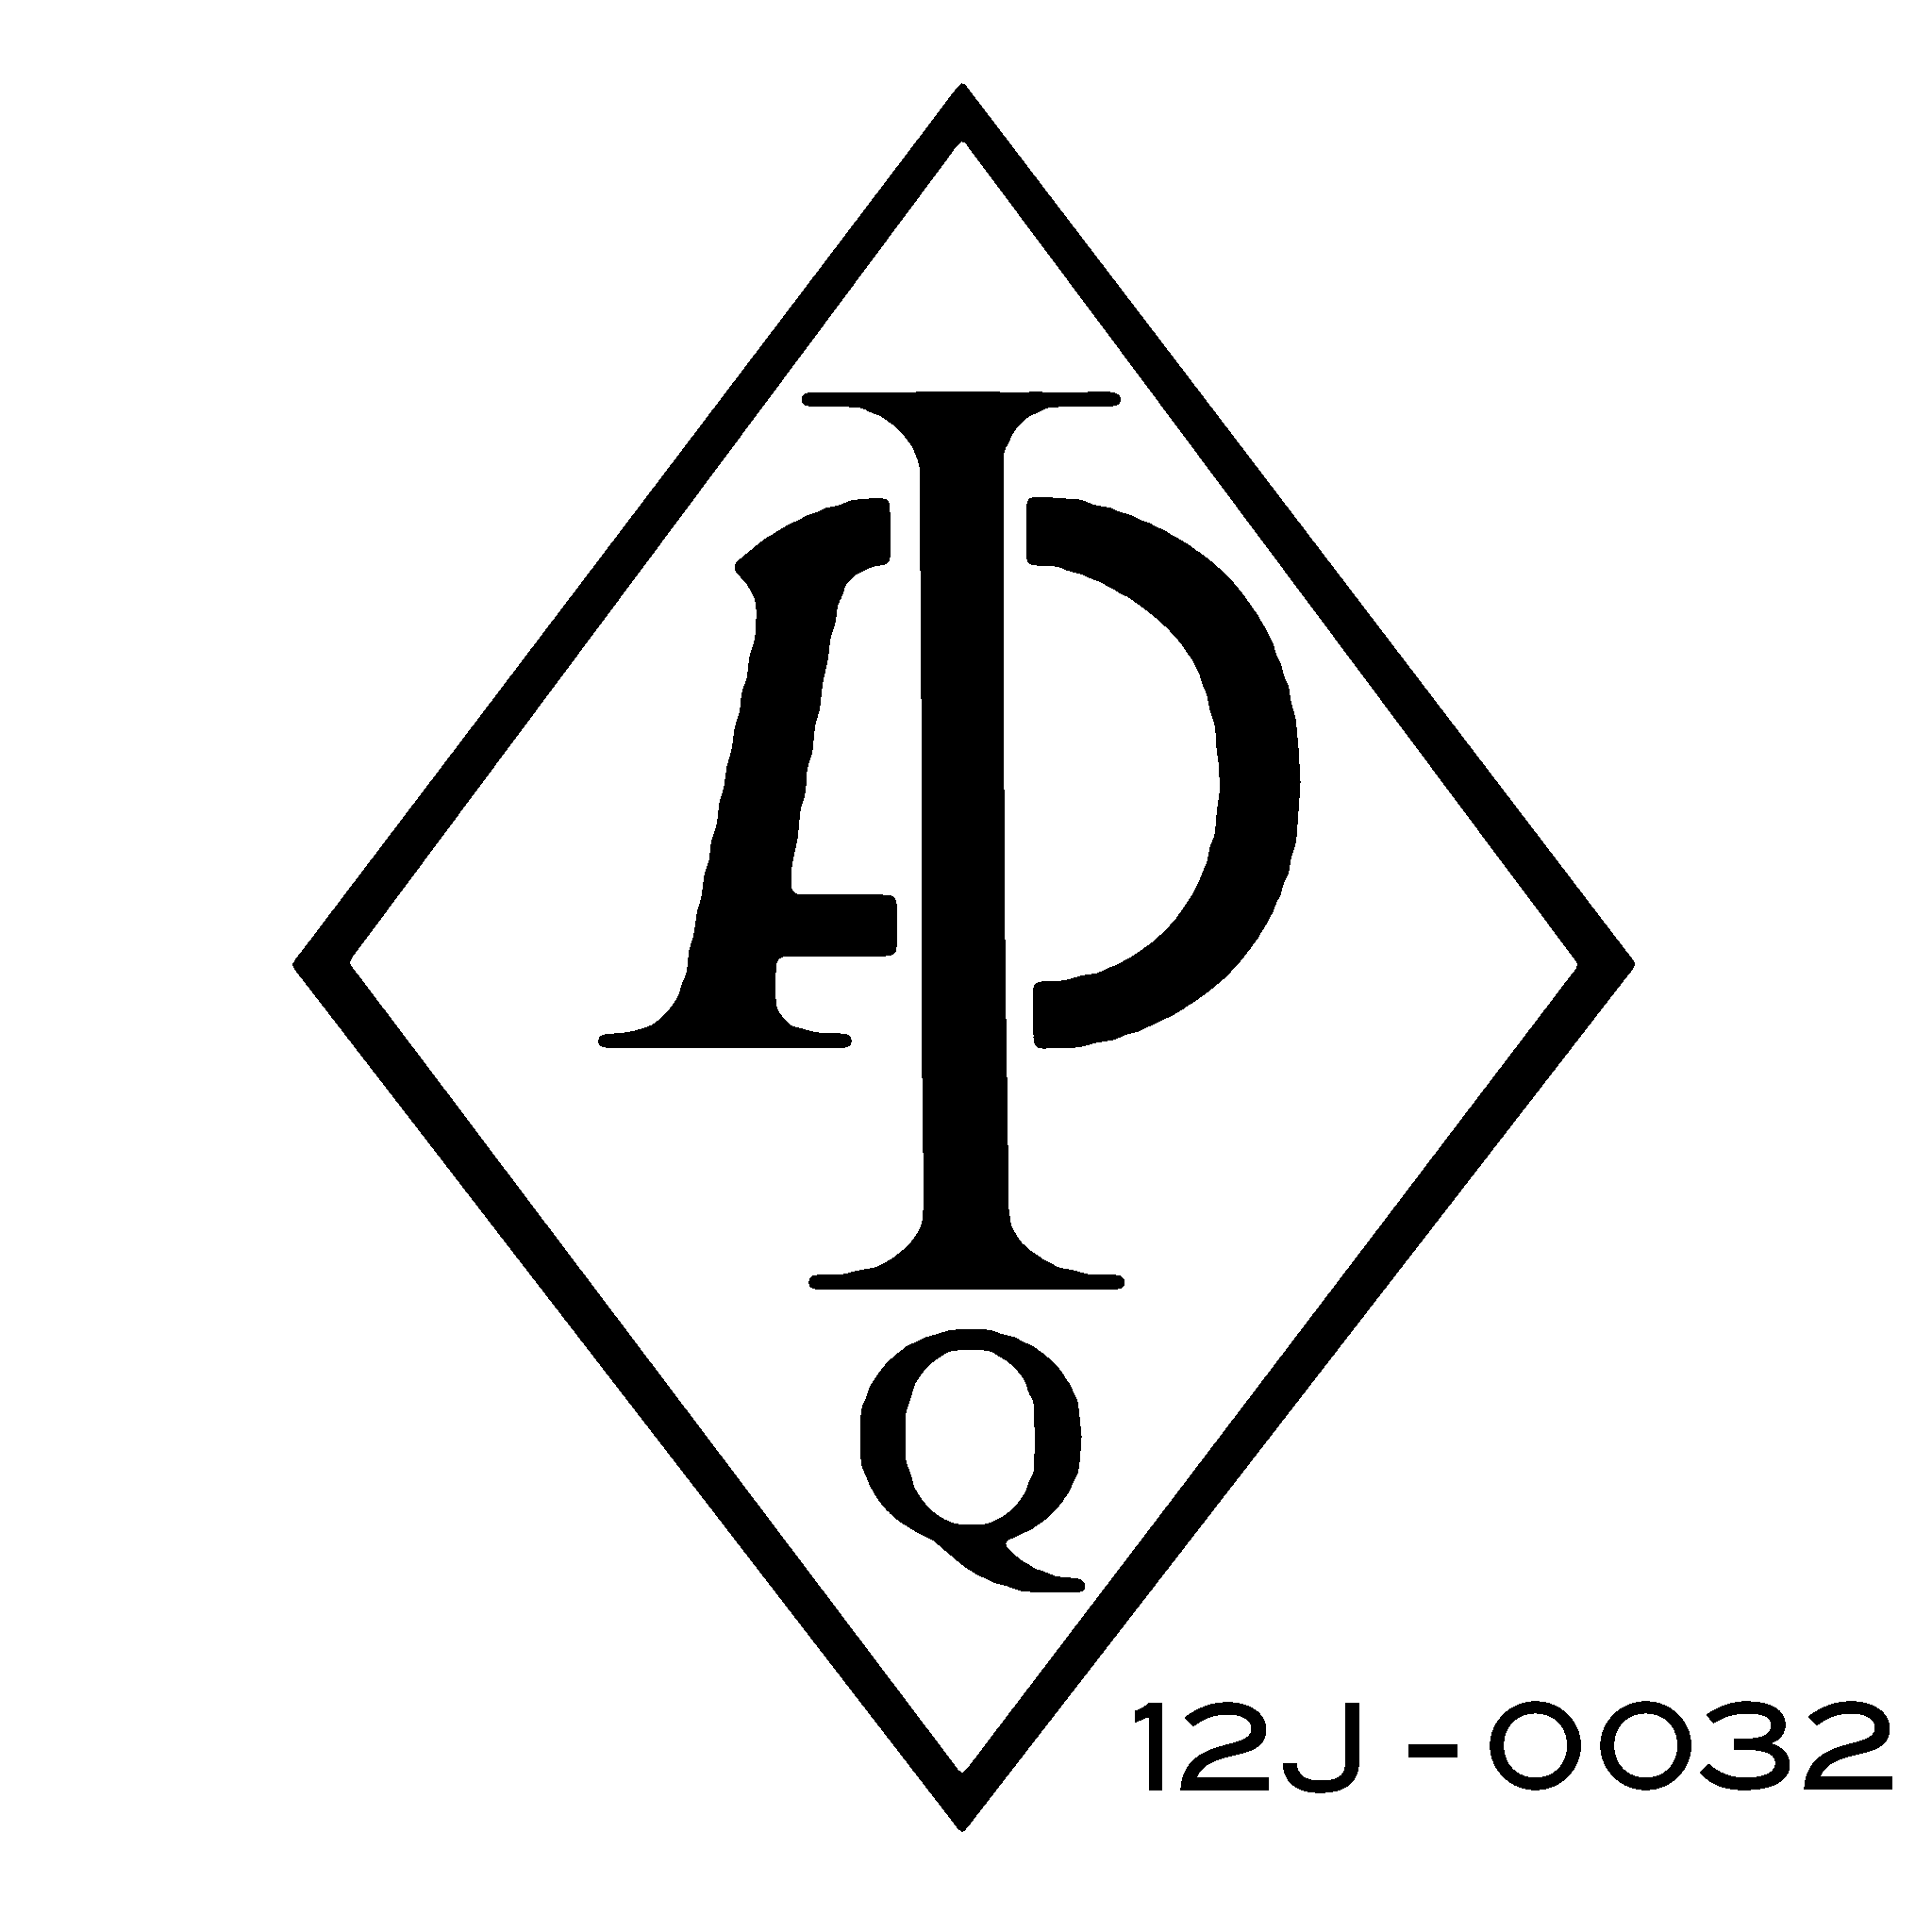 API 12J-0032